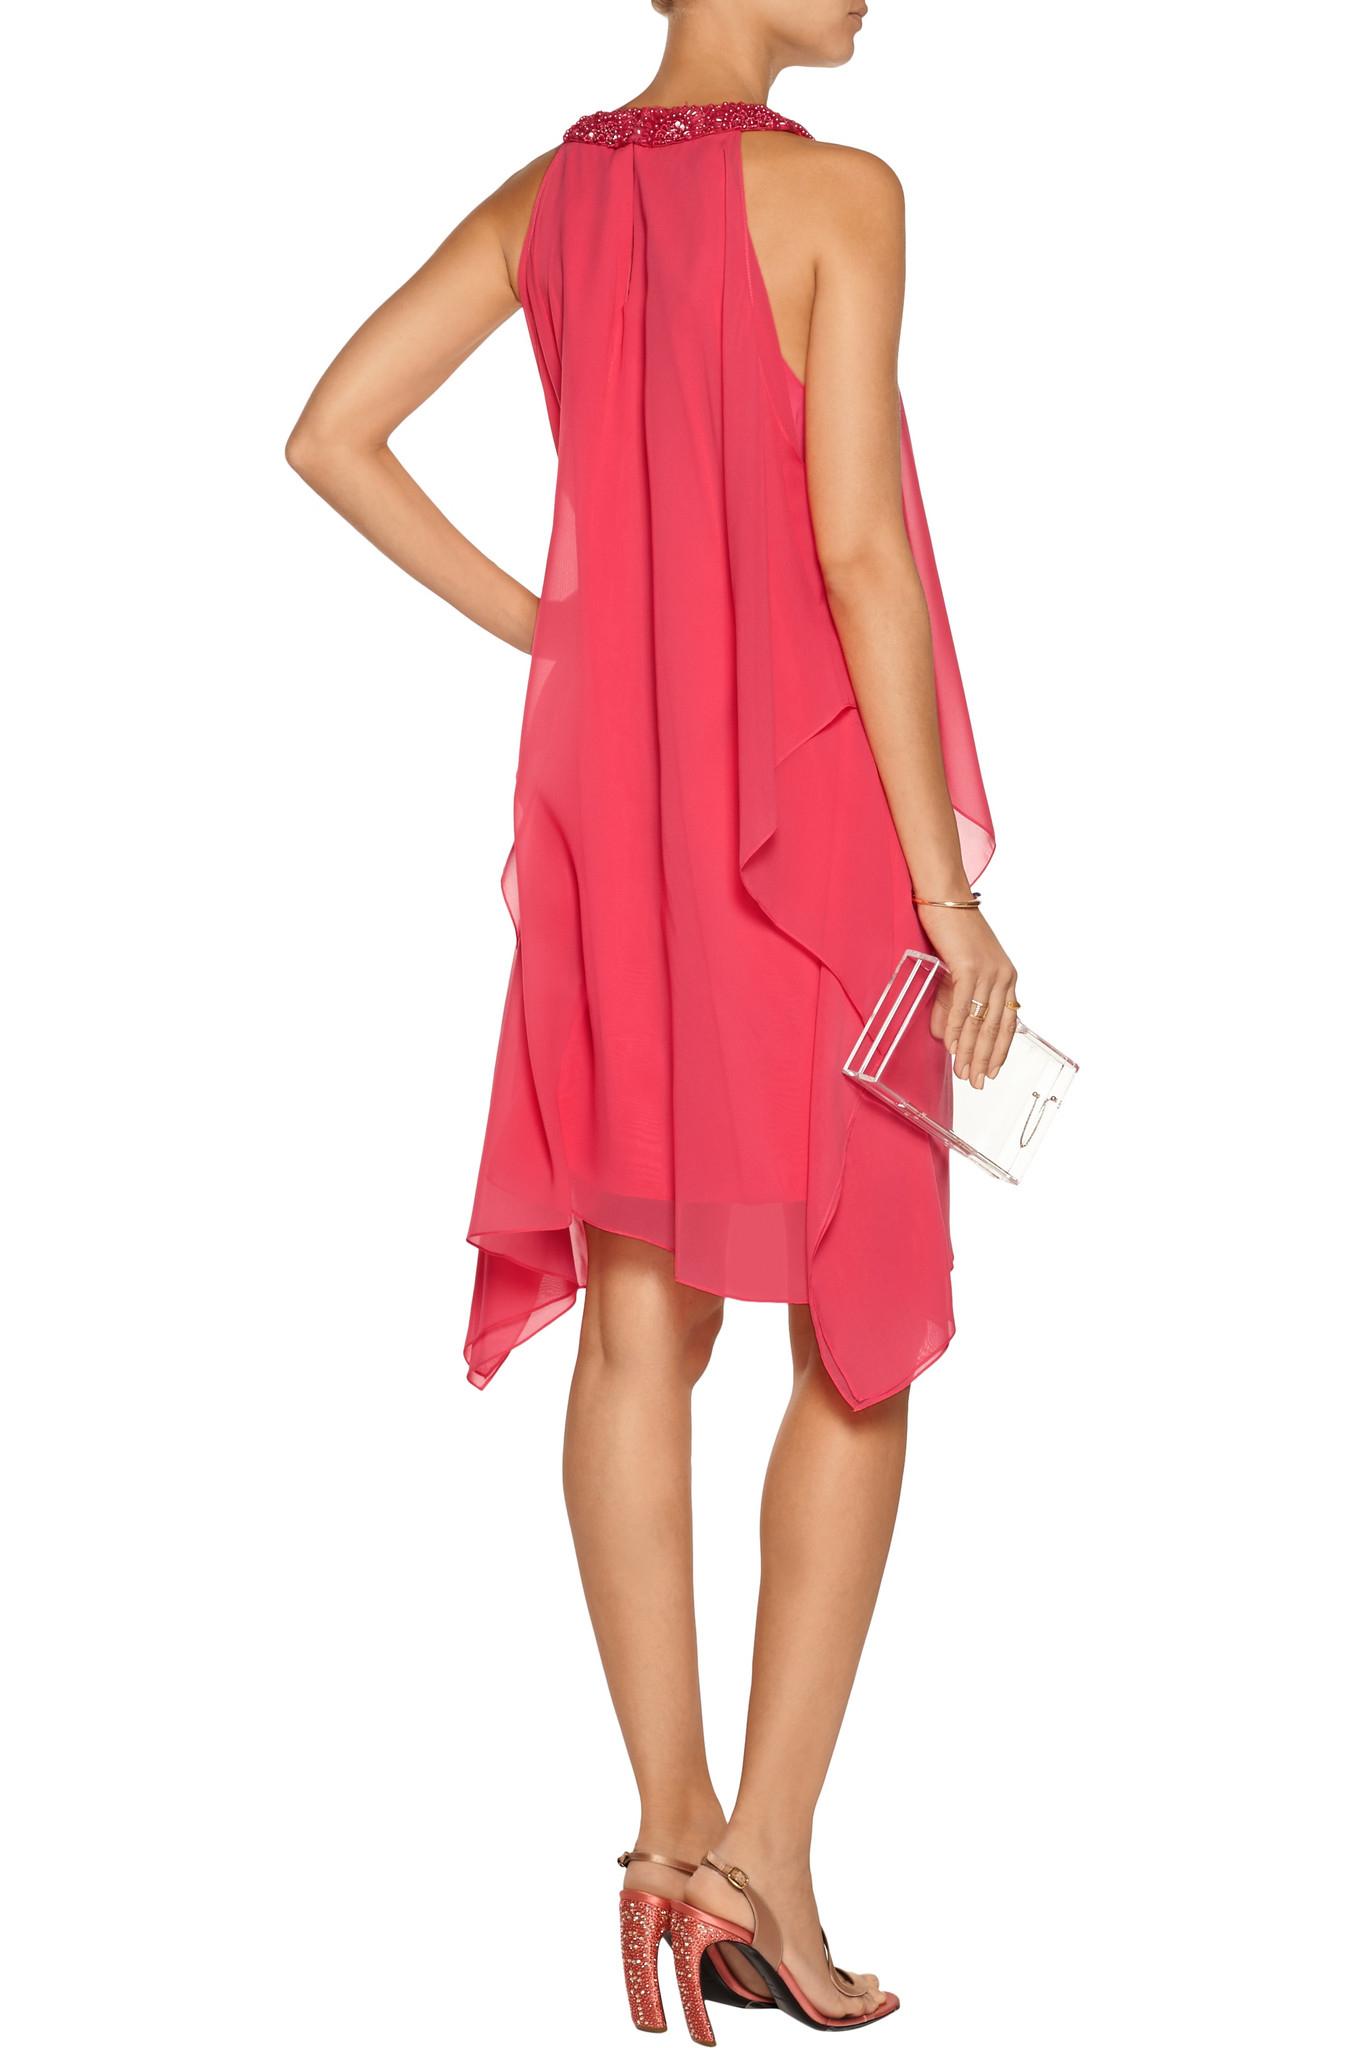 Badgley Mischka Cutout Chiffon Dress In Coral Pink Lyst